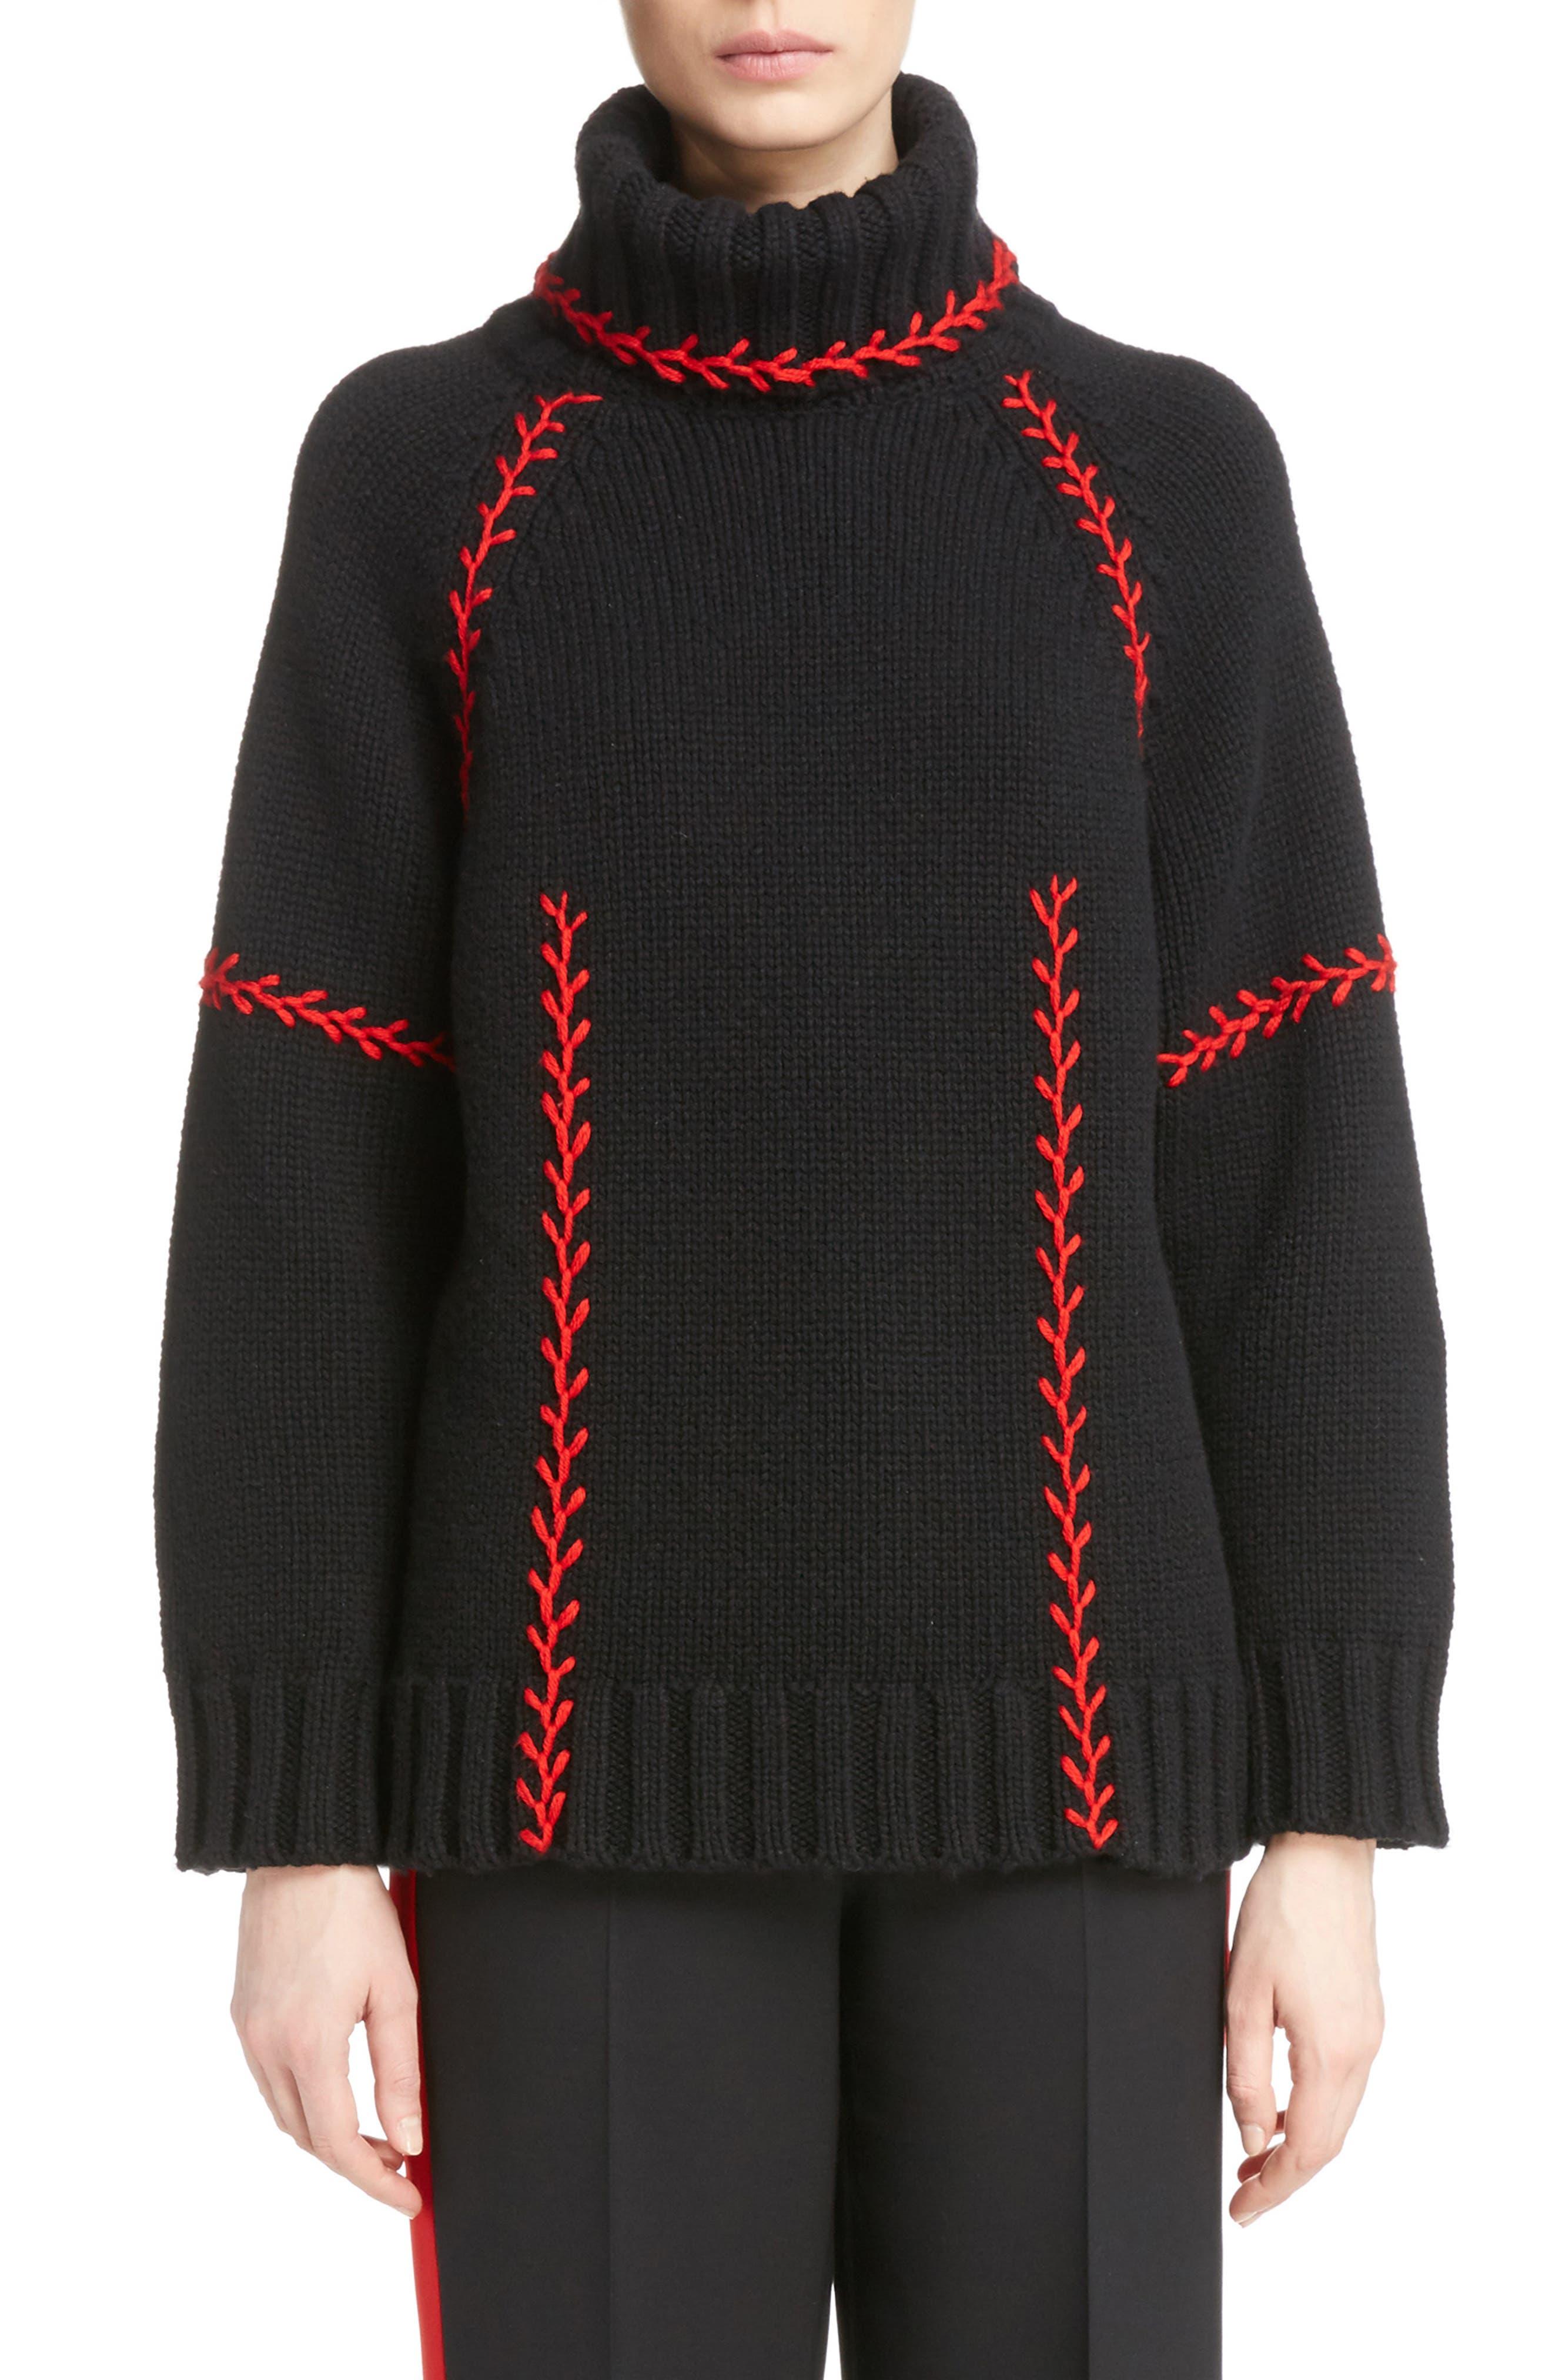 Alternate Image 1 Selected - Alexander McQueen Stitch Detail Cashmere Turtleneck Sweater